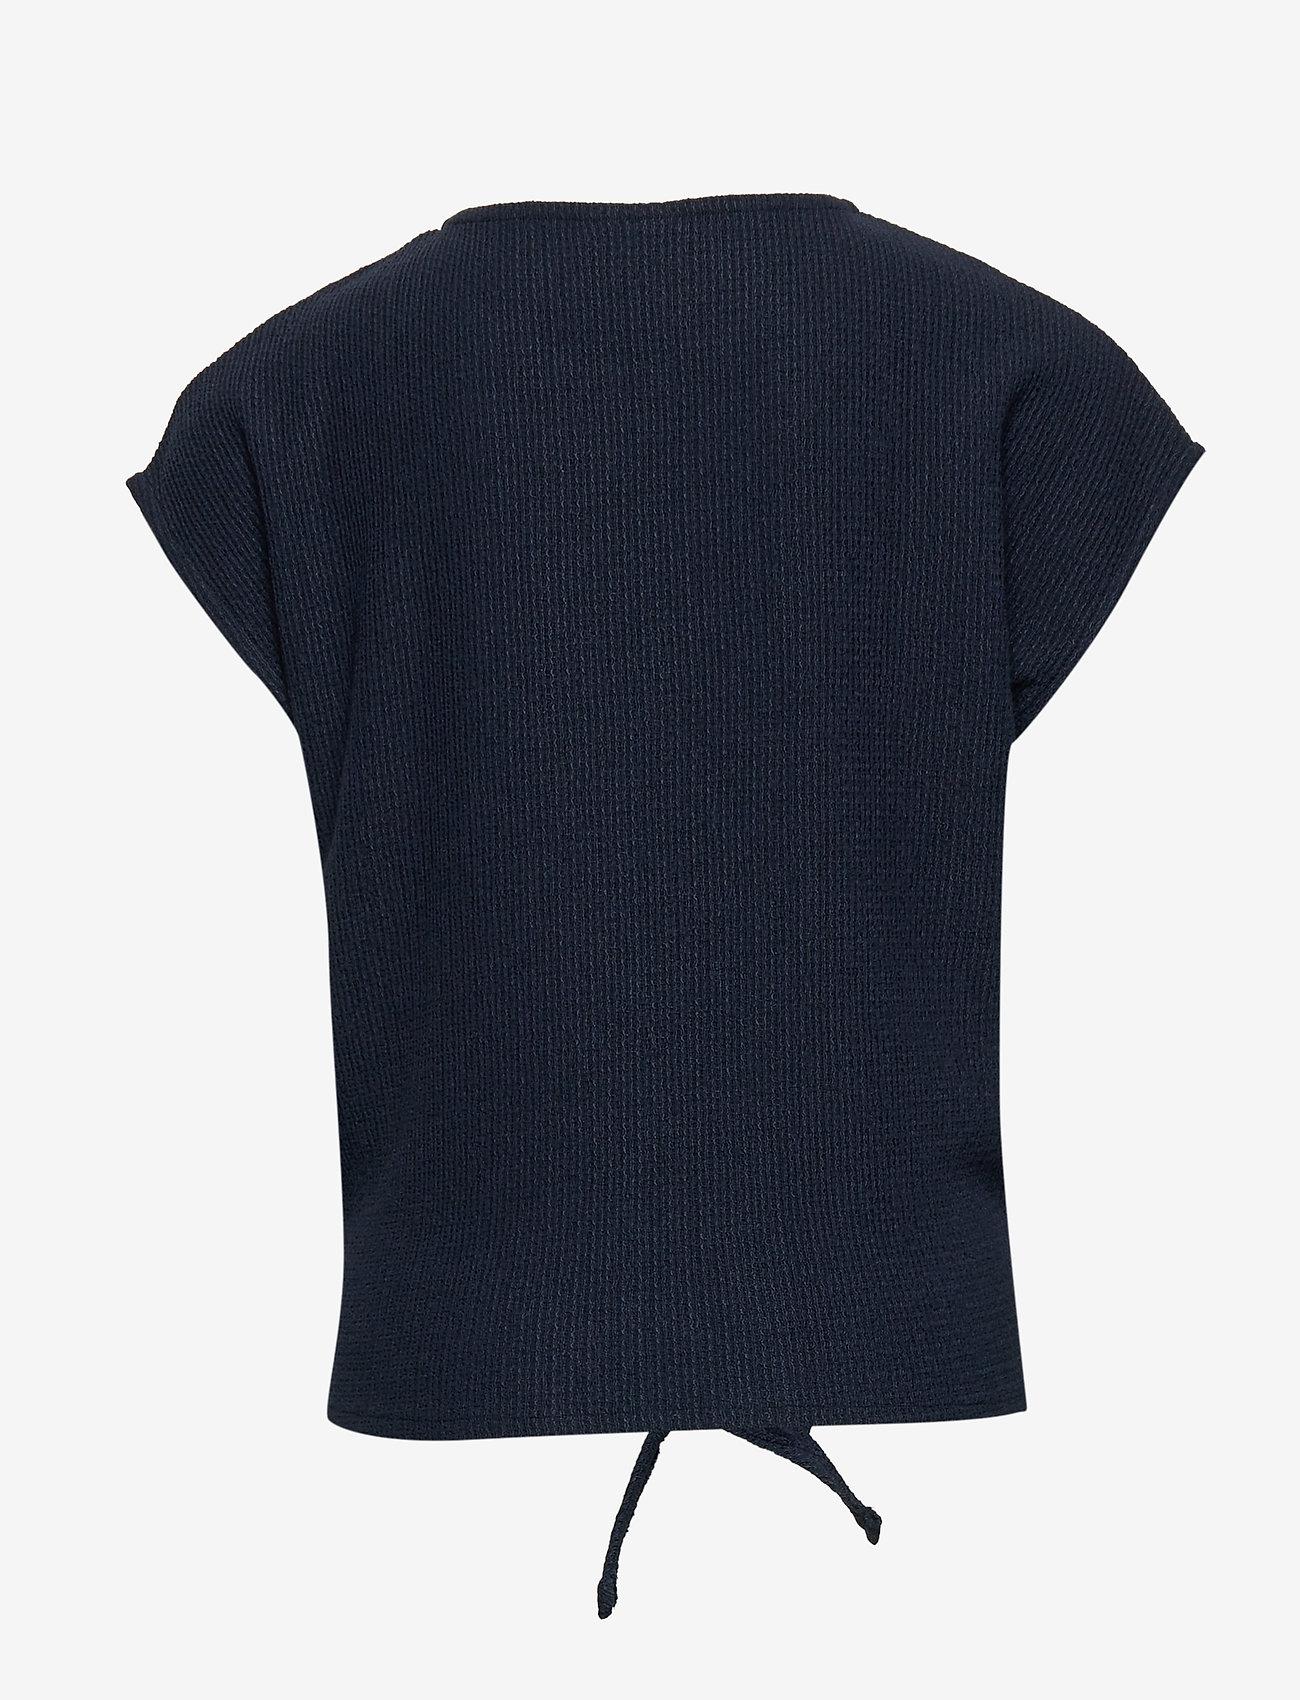 The New - PAM S_S TOP - overhemden - navy blazer - 1